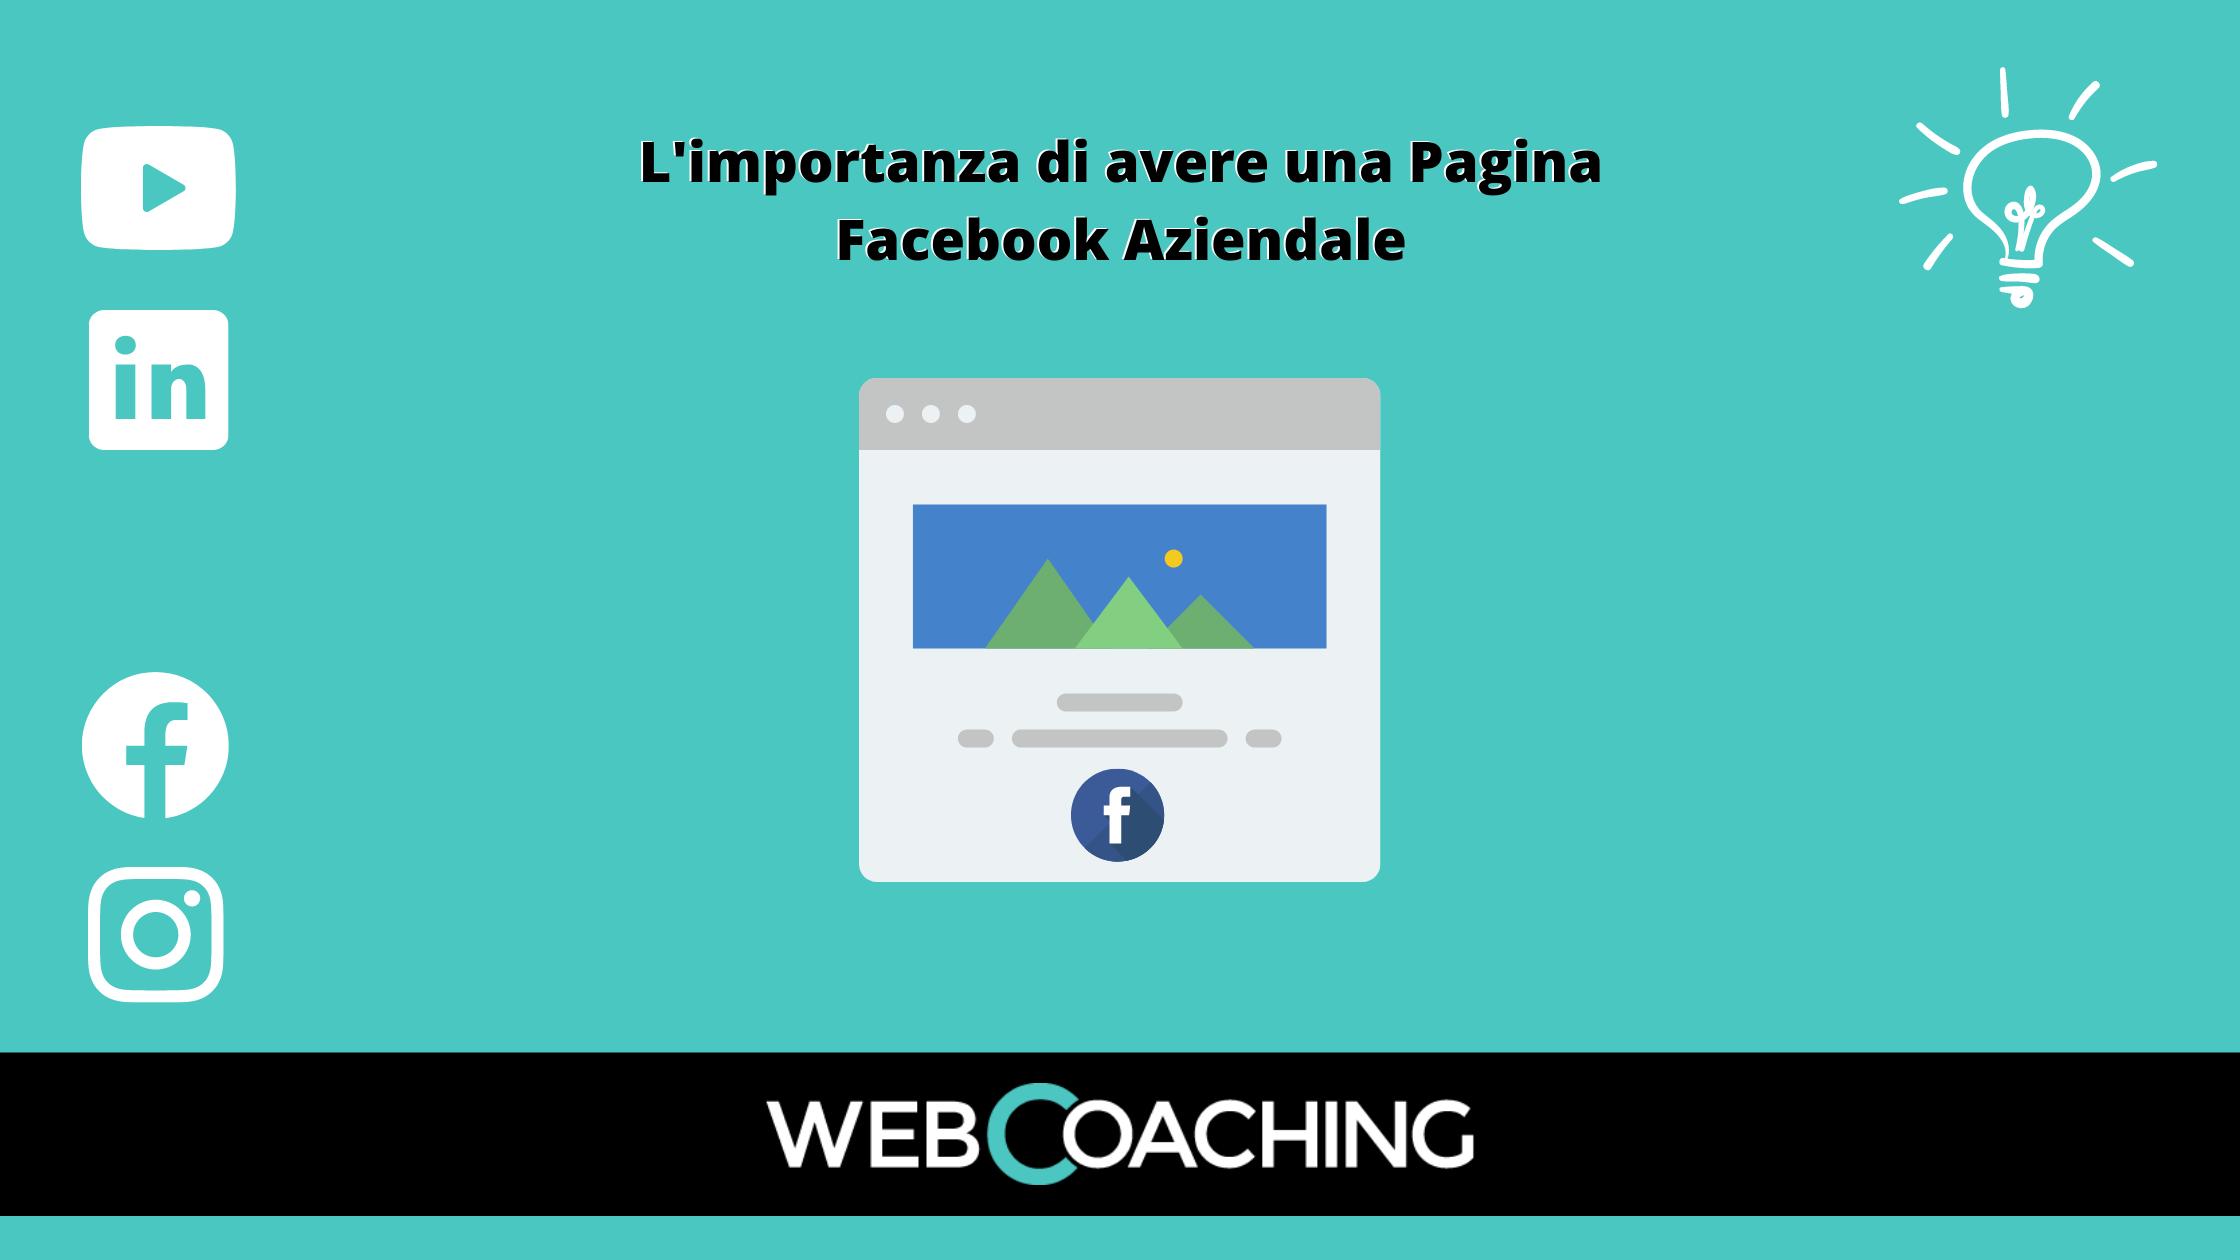 Facebook importanza pagina aziendale